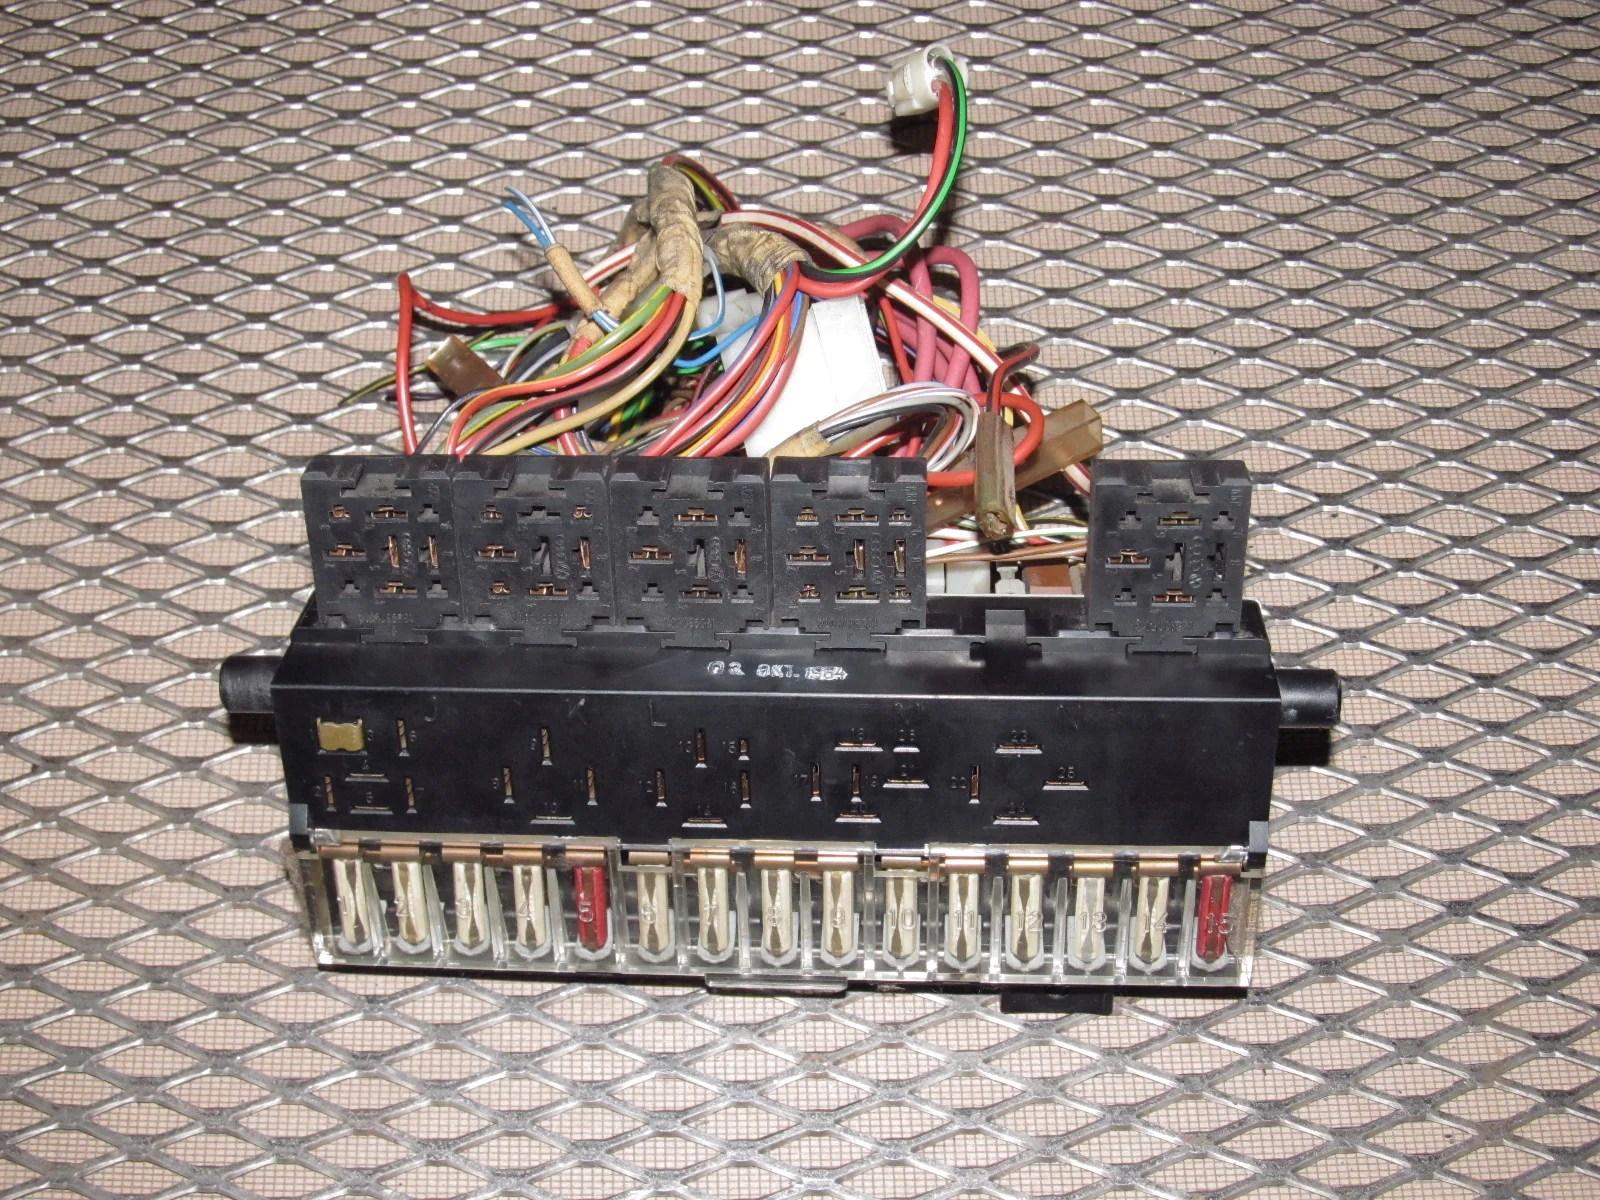 1986 porsche 944 fuse box diagram [ 1600 x 1200 Pixel ]